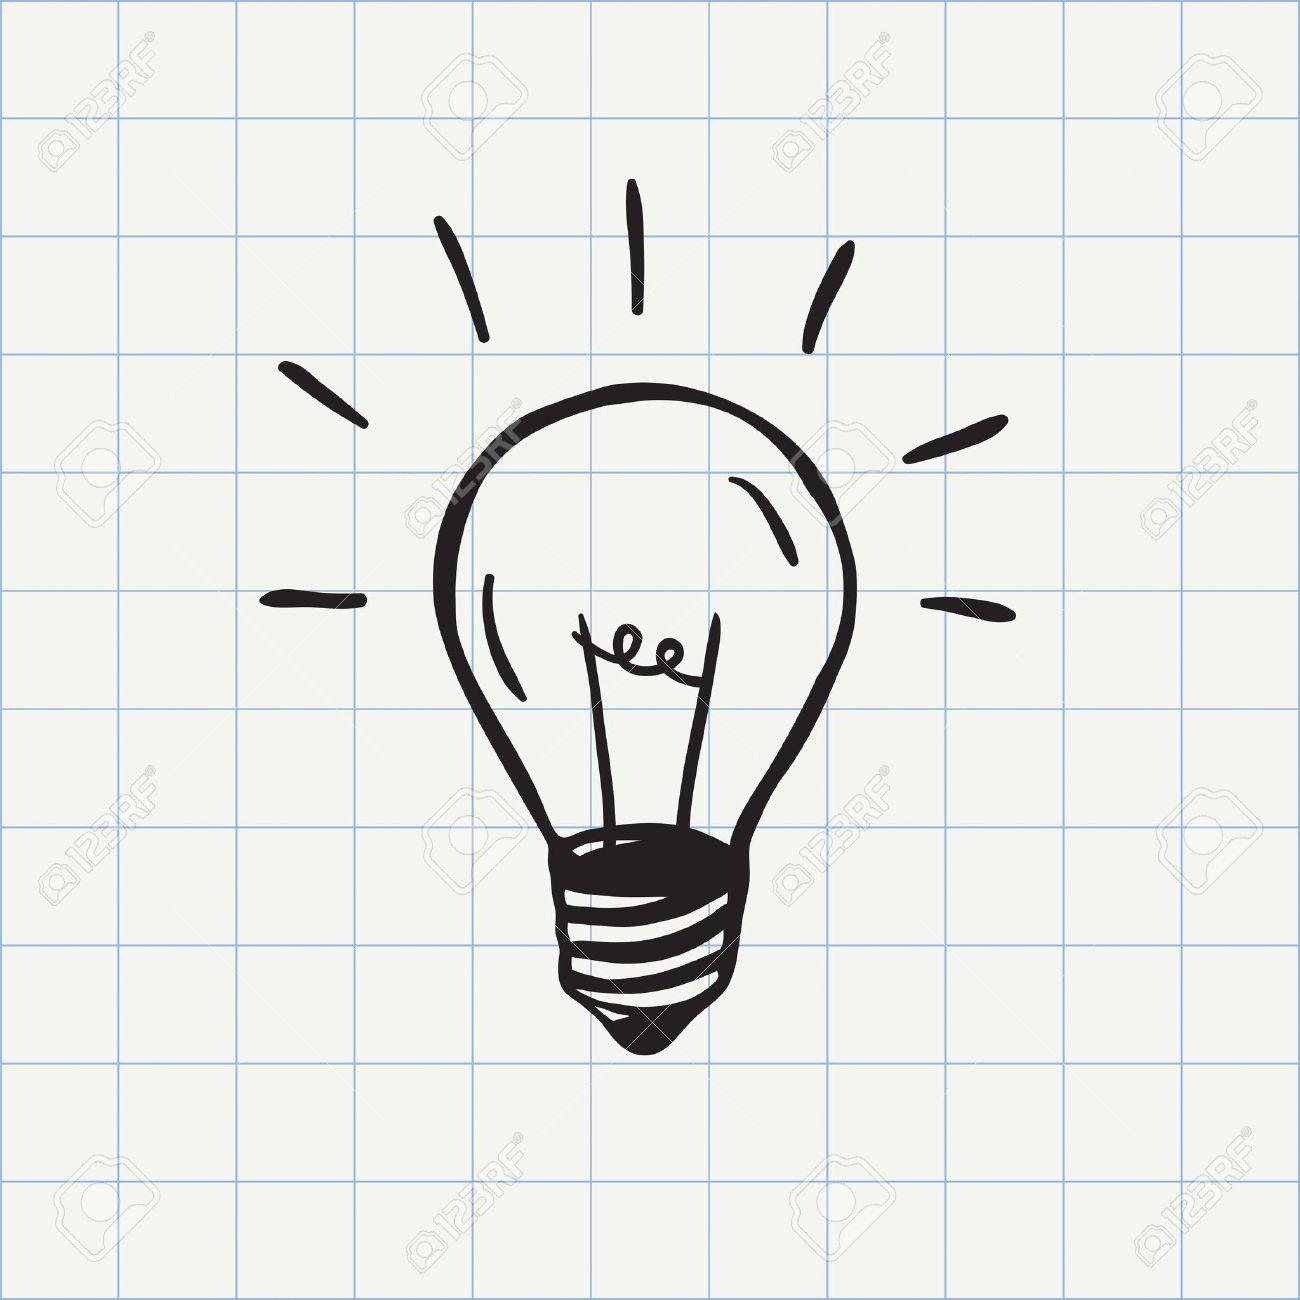 Light Bulb Icon Idea Symbol Sketch In Vector. Hand-drawn Doodle ...